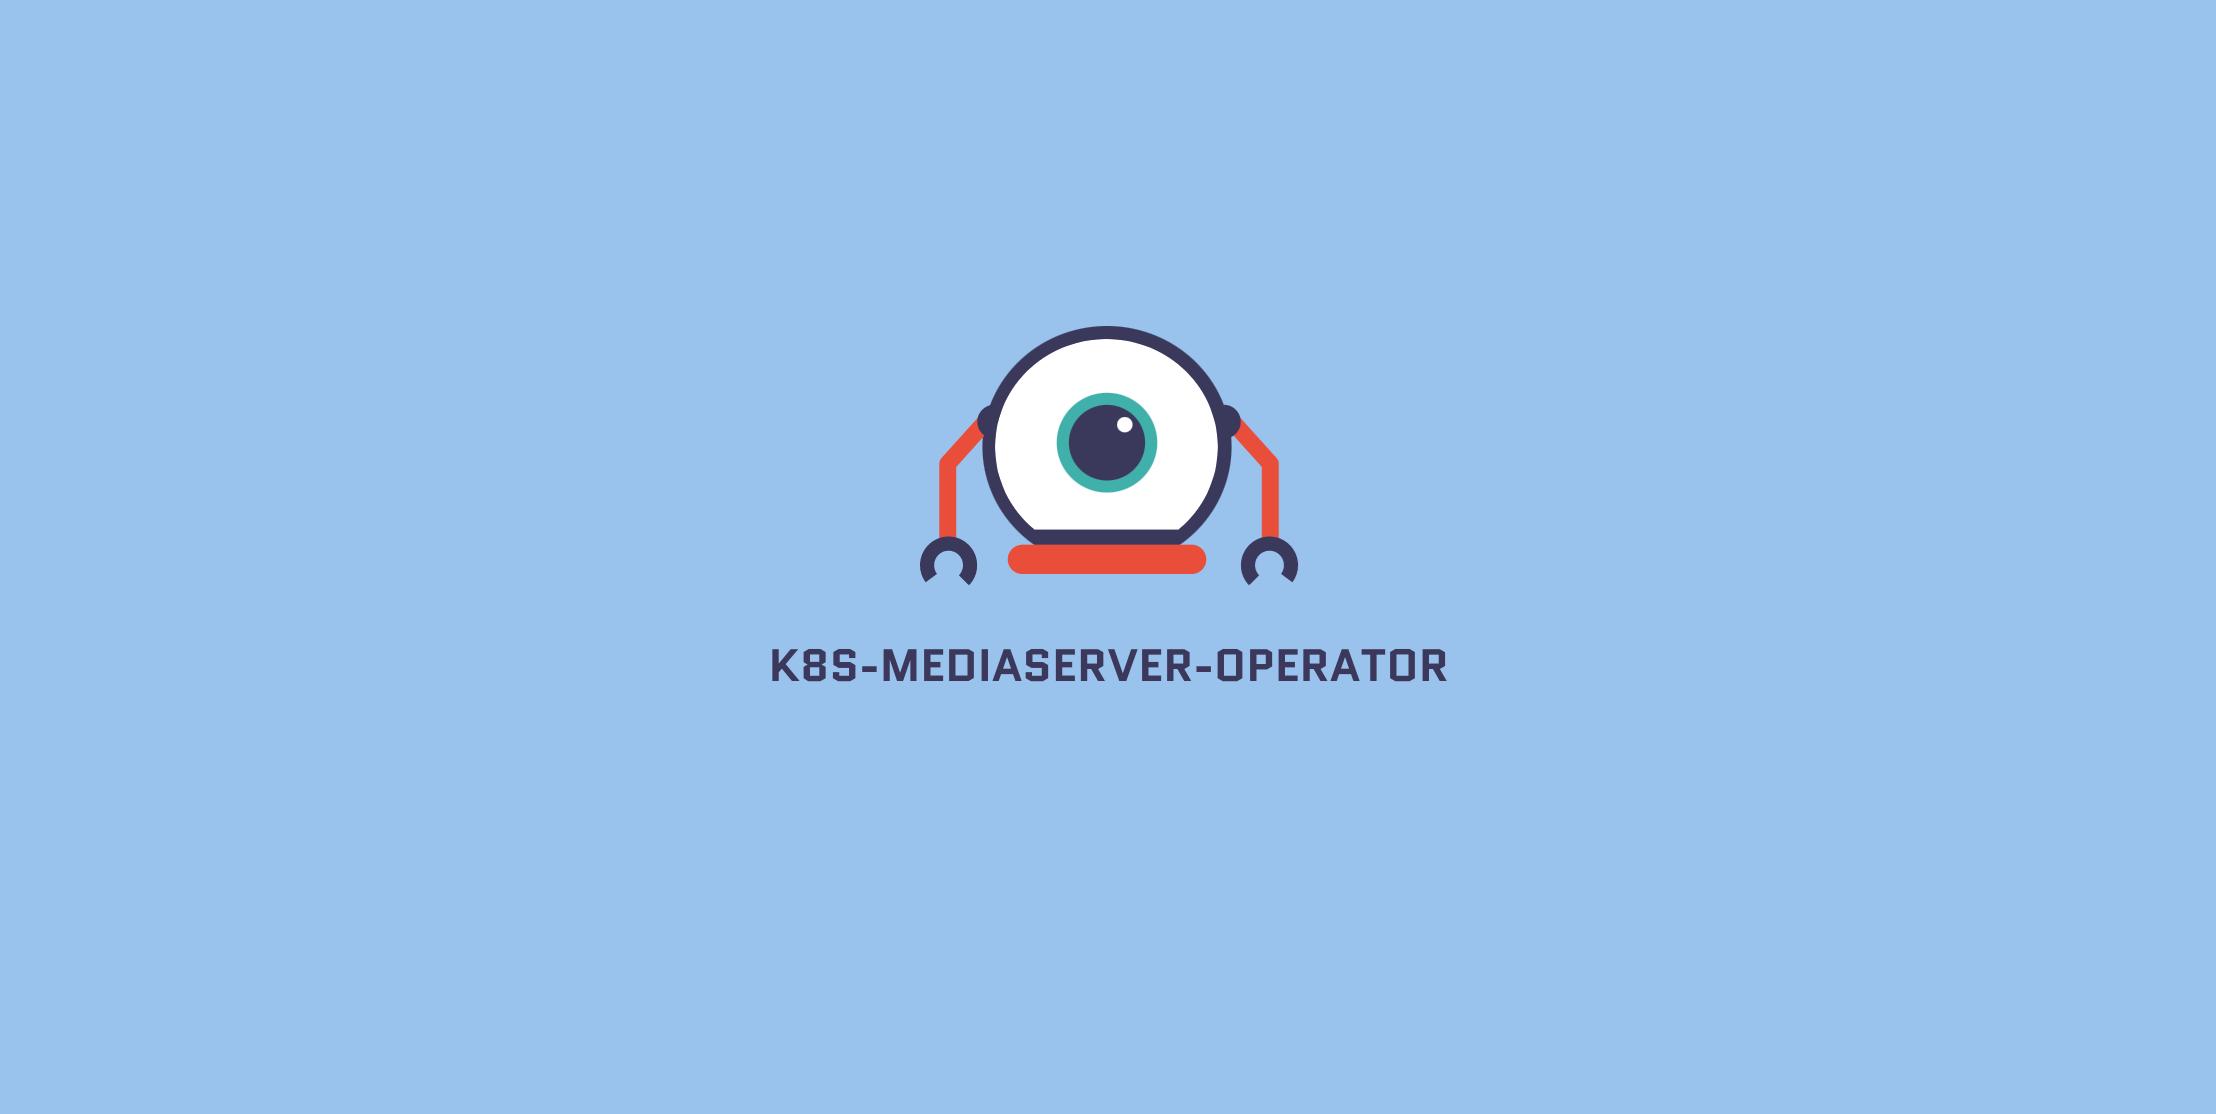 k8s-mediaserver-operator